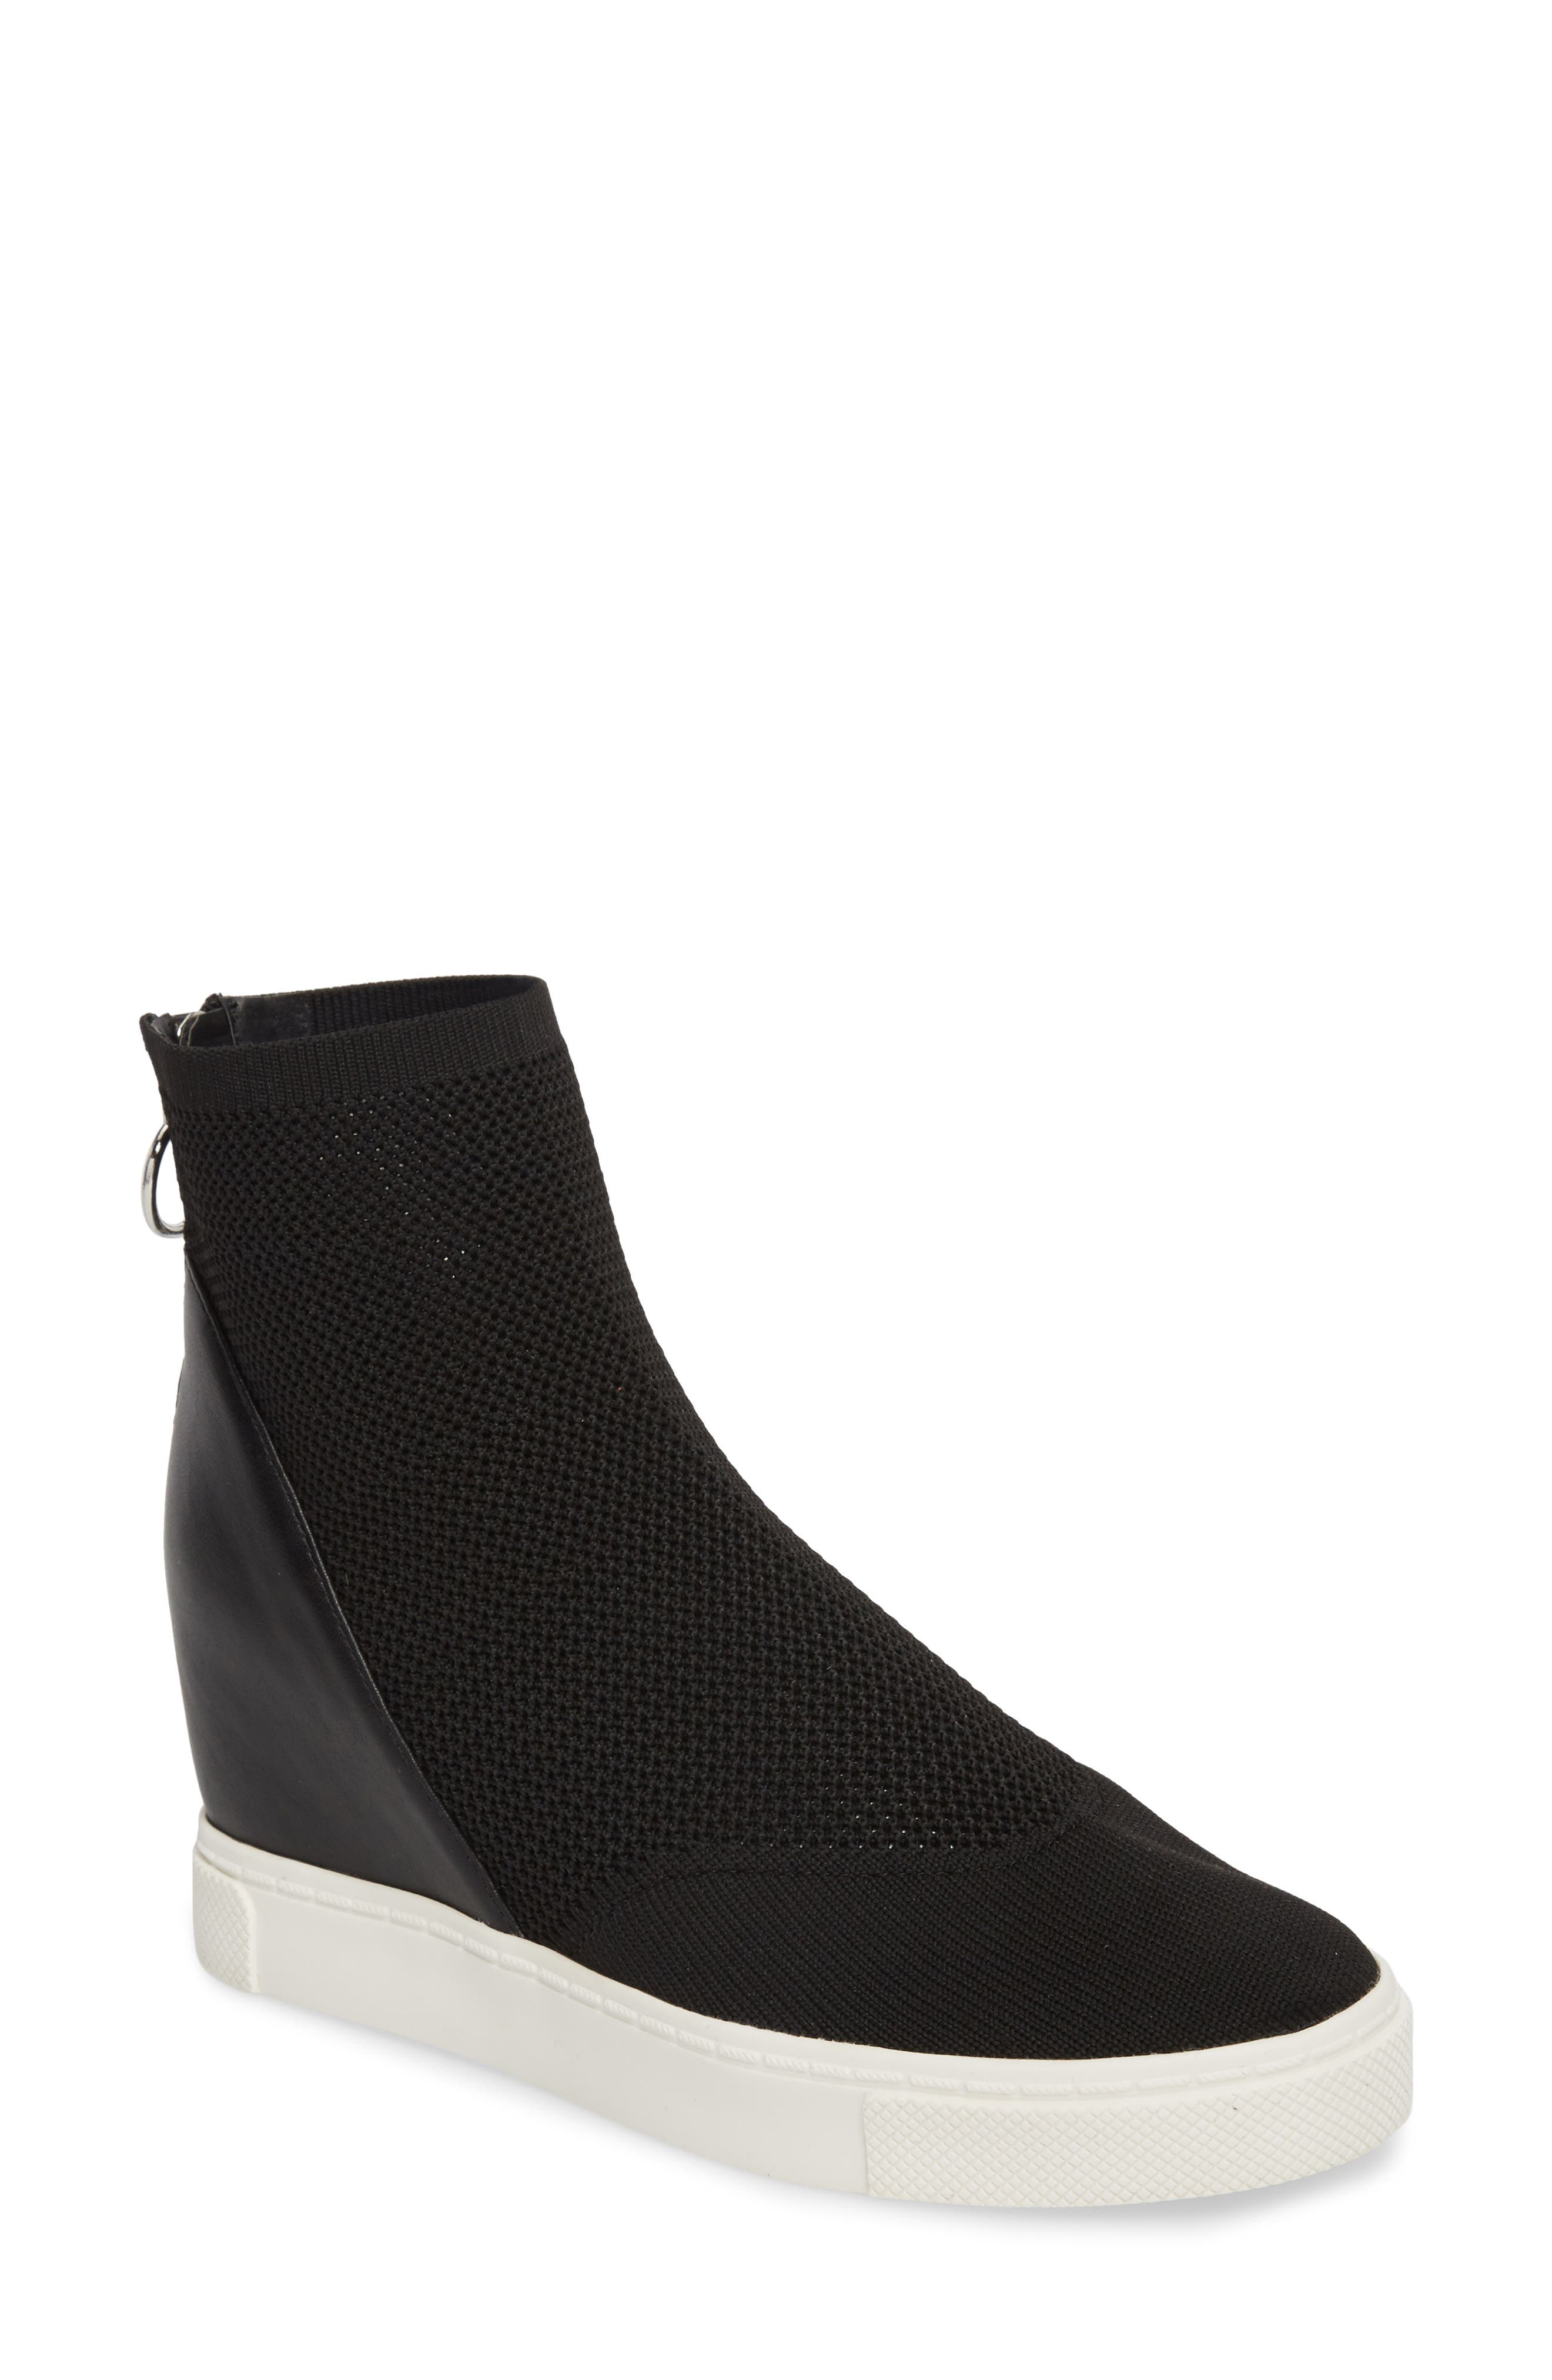 Lizzy Sneaker Bootie,                         Main,                         color, Black